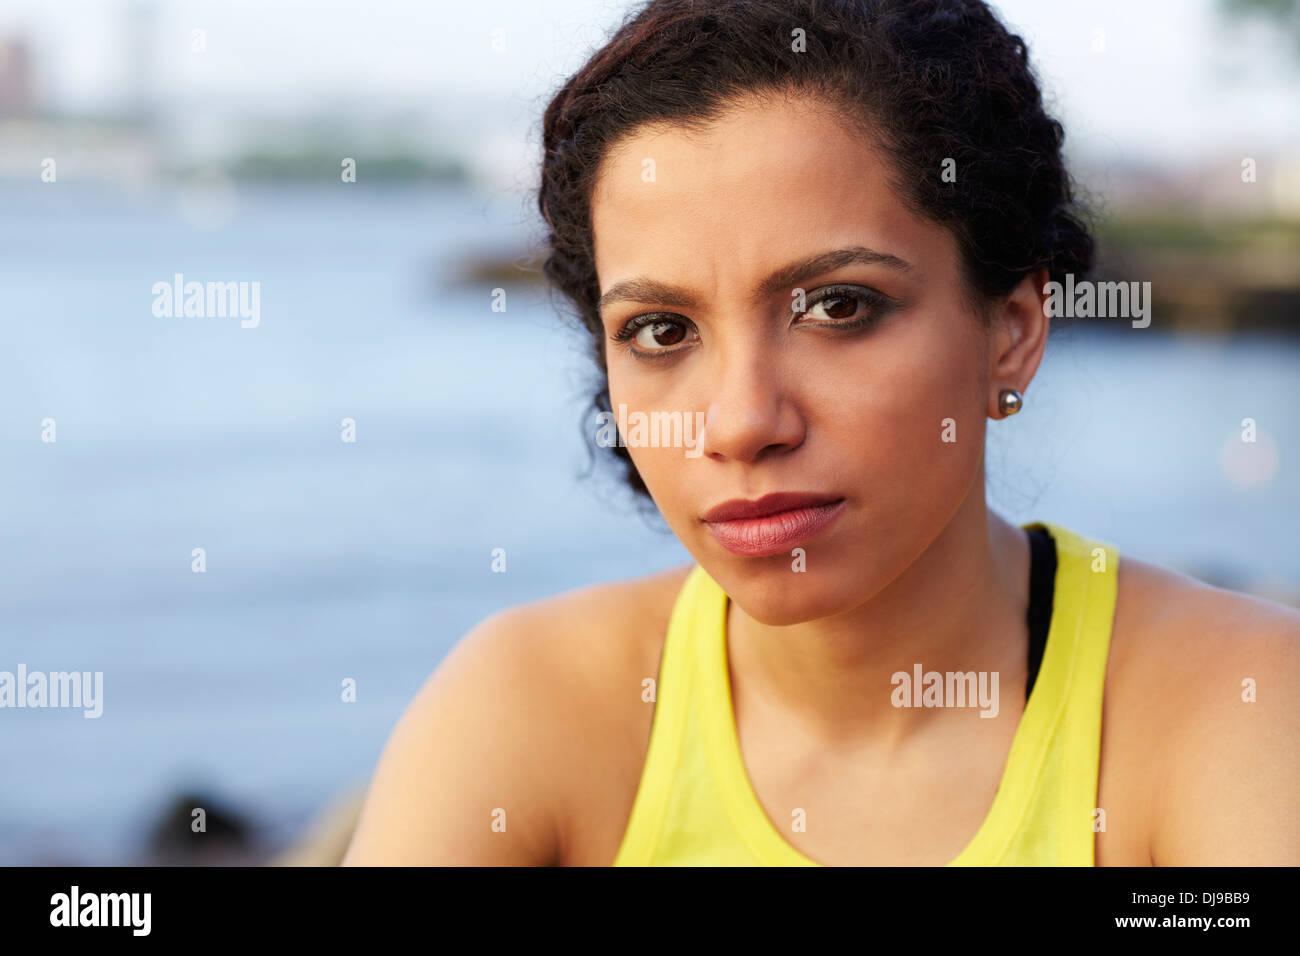 Close up of mixed race woman's face Stock Photo